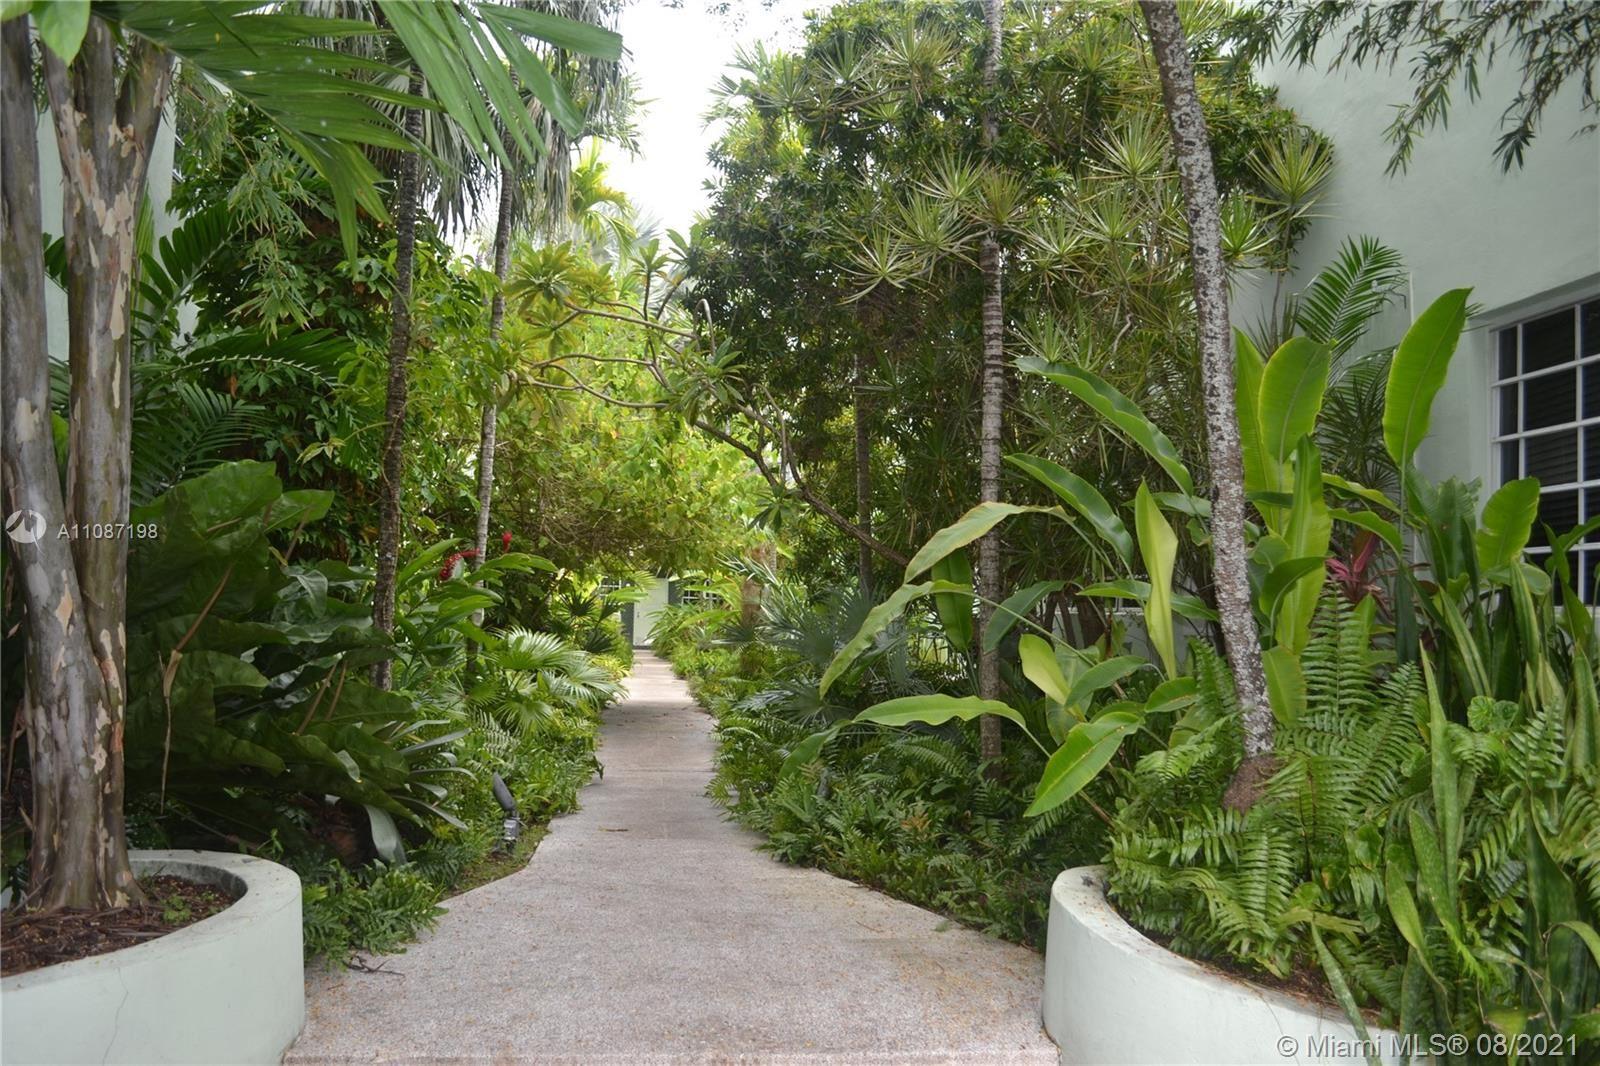 1571 Pennsylvania Ave #3S, Miami Beach, FL 33139 - #: A11087198